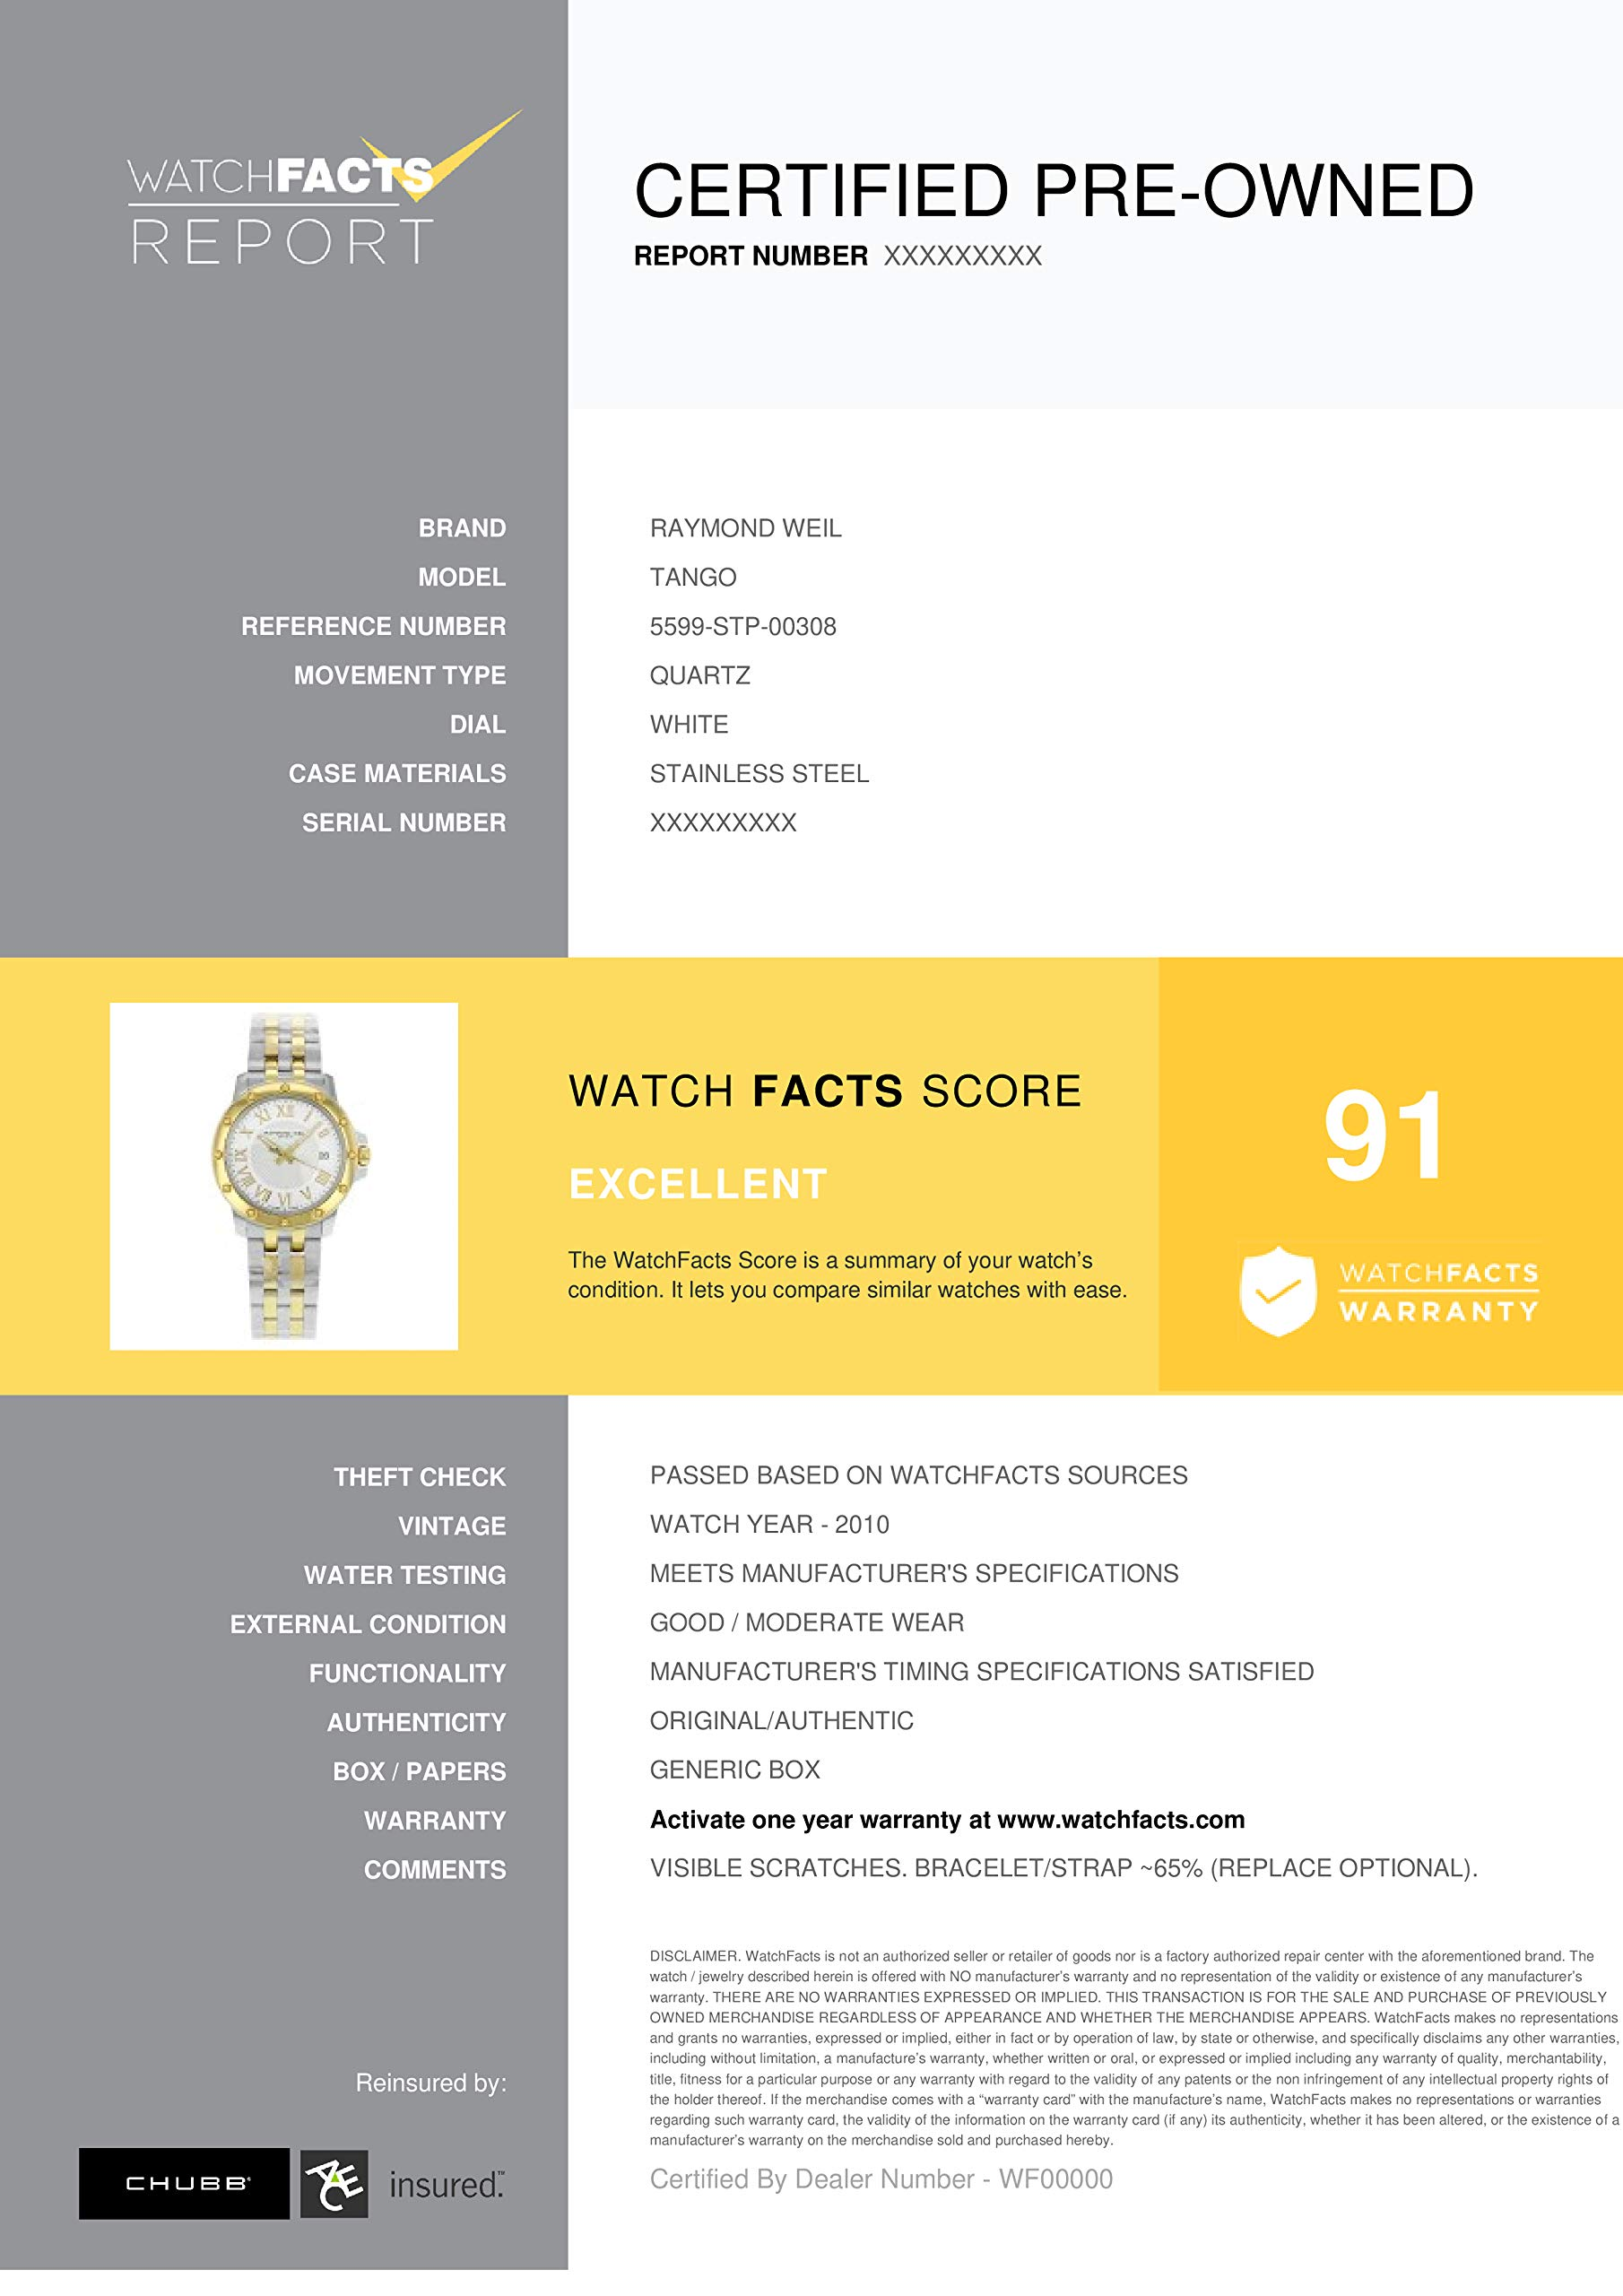 Raymond Weil Tango Quartz Male Watch 5599-STP-00308 (Certified Pre-Owned) by RAYMOND WEIL (Image #5)